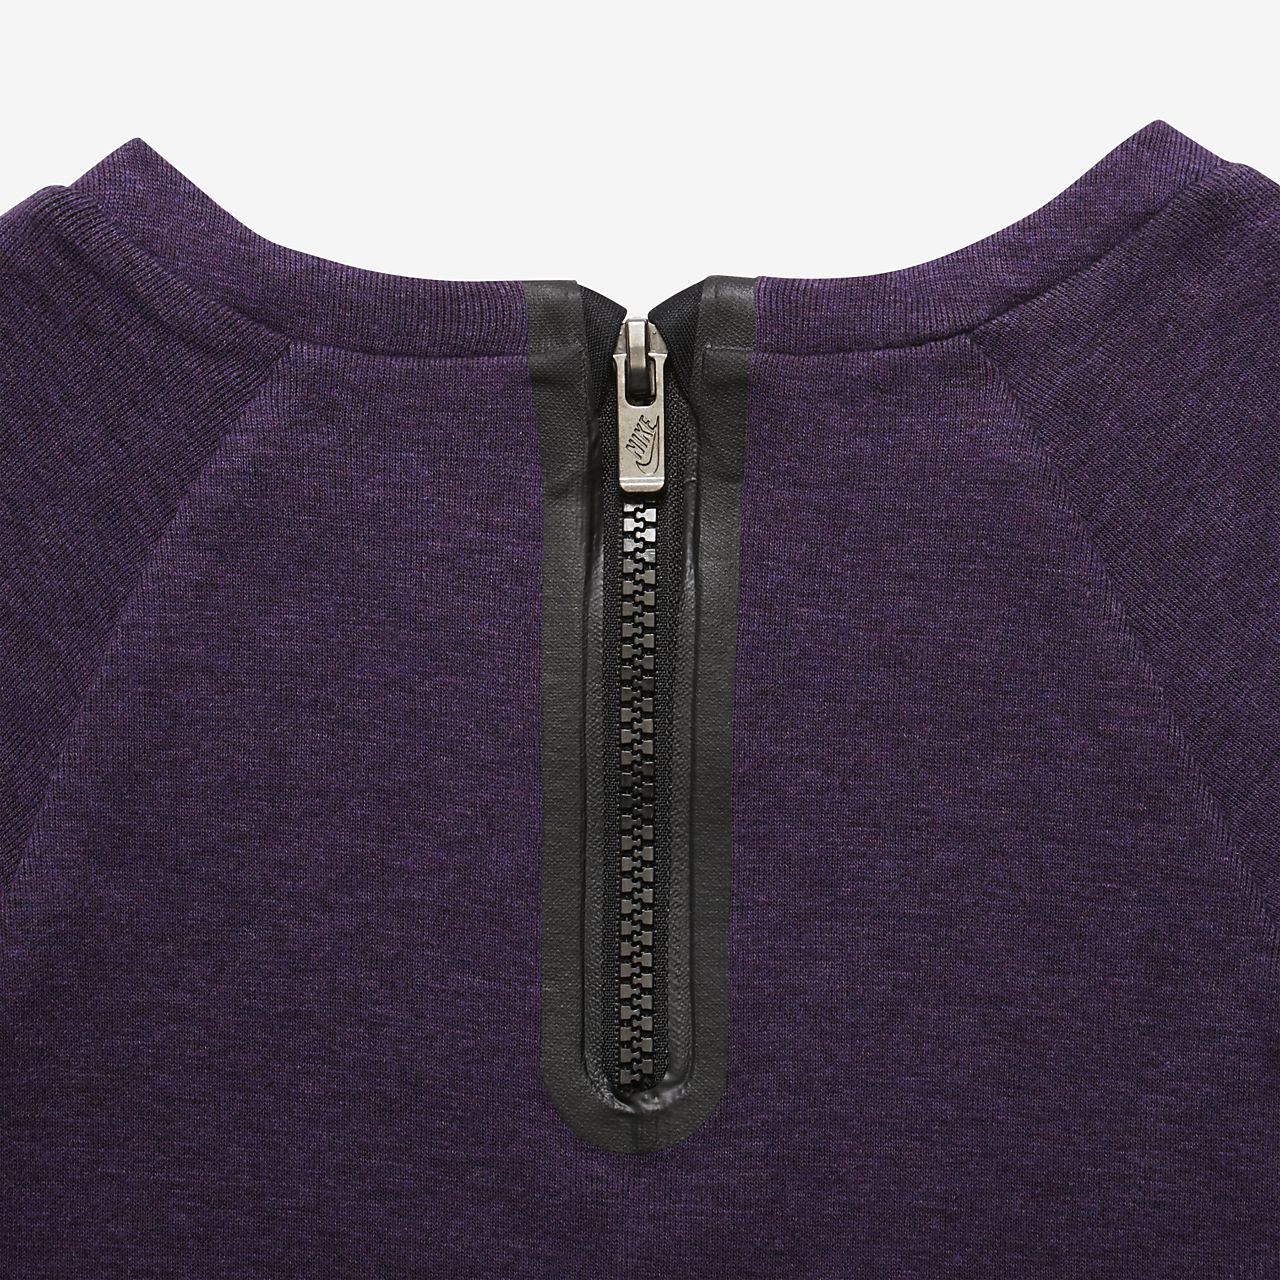 93507e73f98 Κοριτσίστικο φόρεμα Nike Tech Fleece για βρέφη και νήπια. Nike.com GR